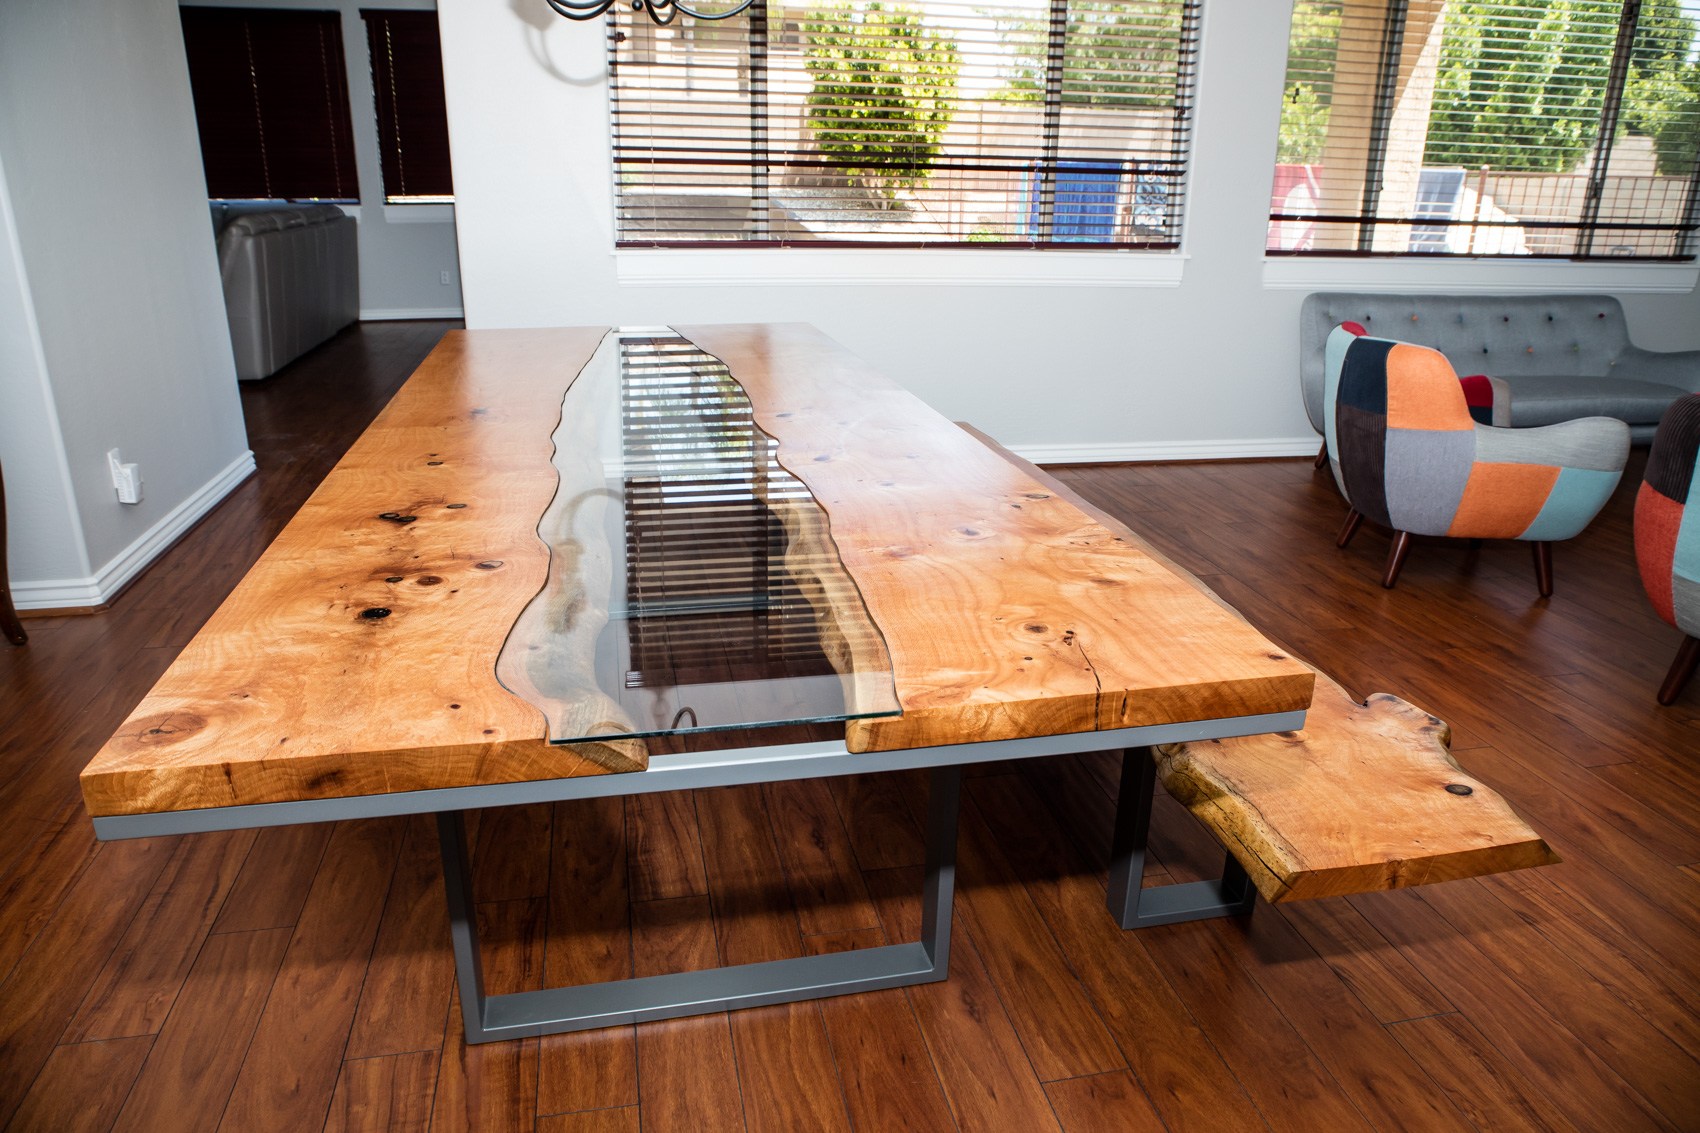 Silky Oak River Table + Bench Build | LumberLust Designs, Upscale Live Edge  Furniture Made In Arizona